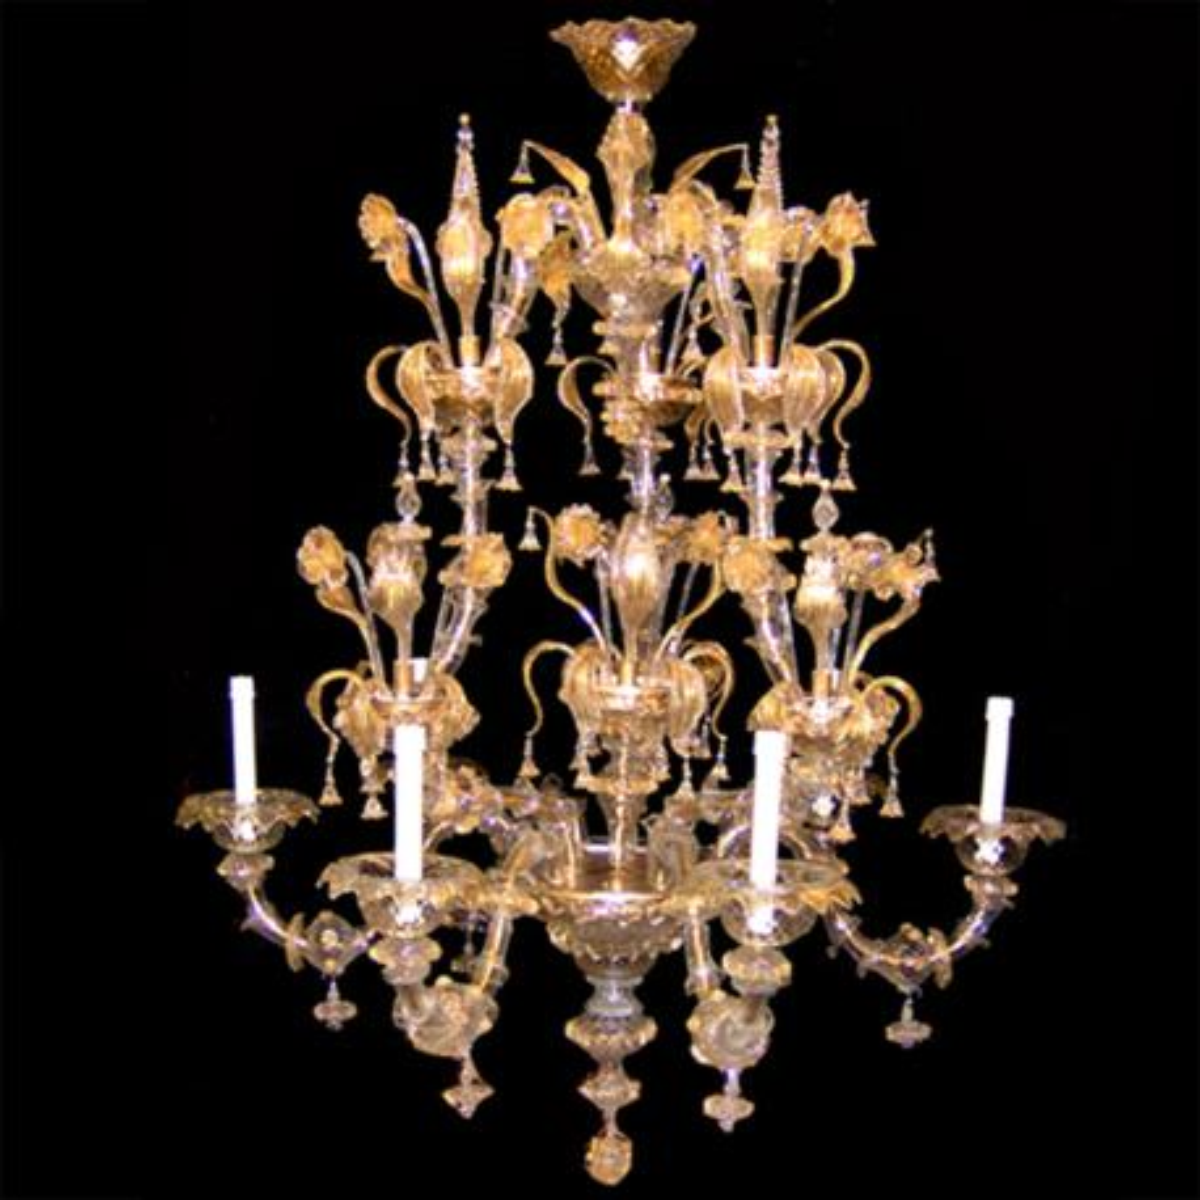 """Arianna"" Murano glass chandelier - 6 lights - gold"